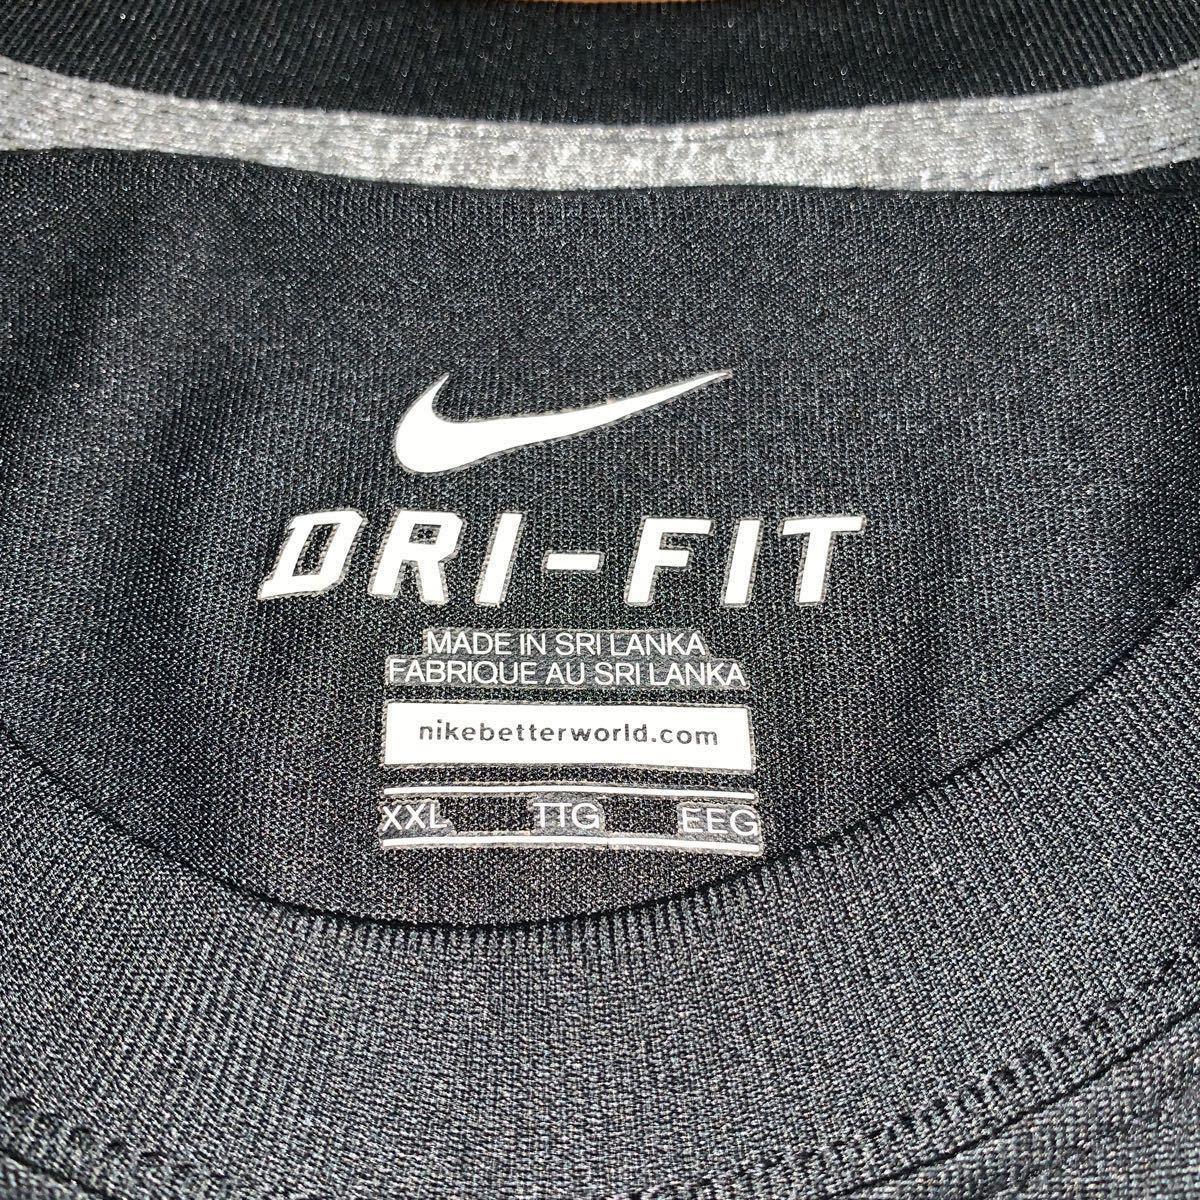 Nike DRY FIT ナイキ ドライフィット 半袖 XXL ブラック XL 2XL 速乾 ドライ Tシャツ NIKE 半袖Tシャツ 黒_画像2